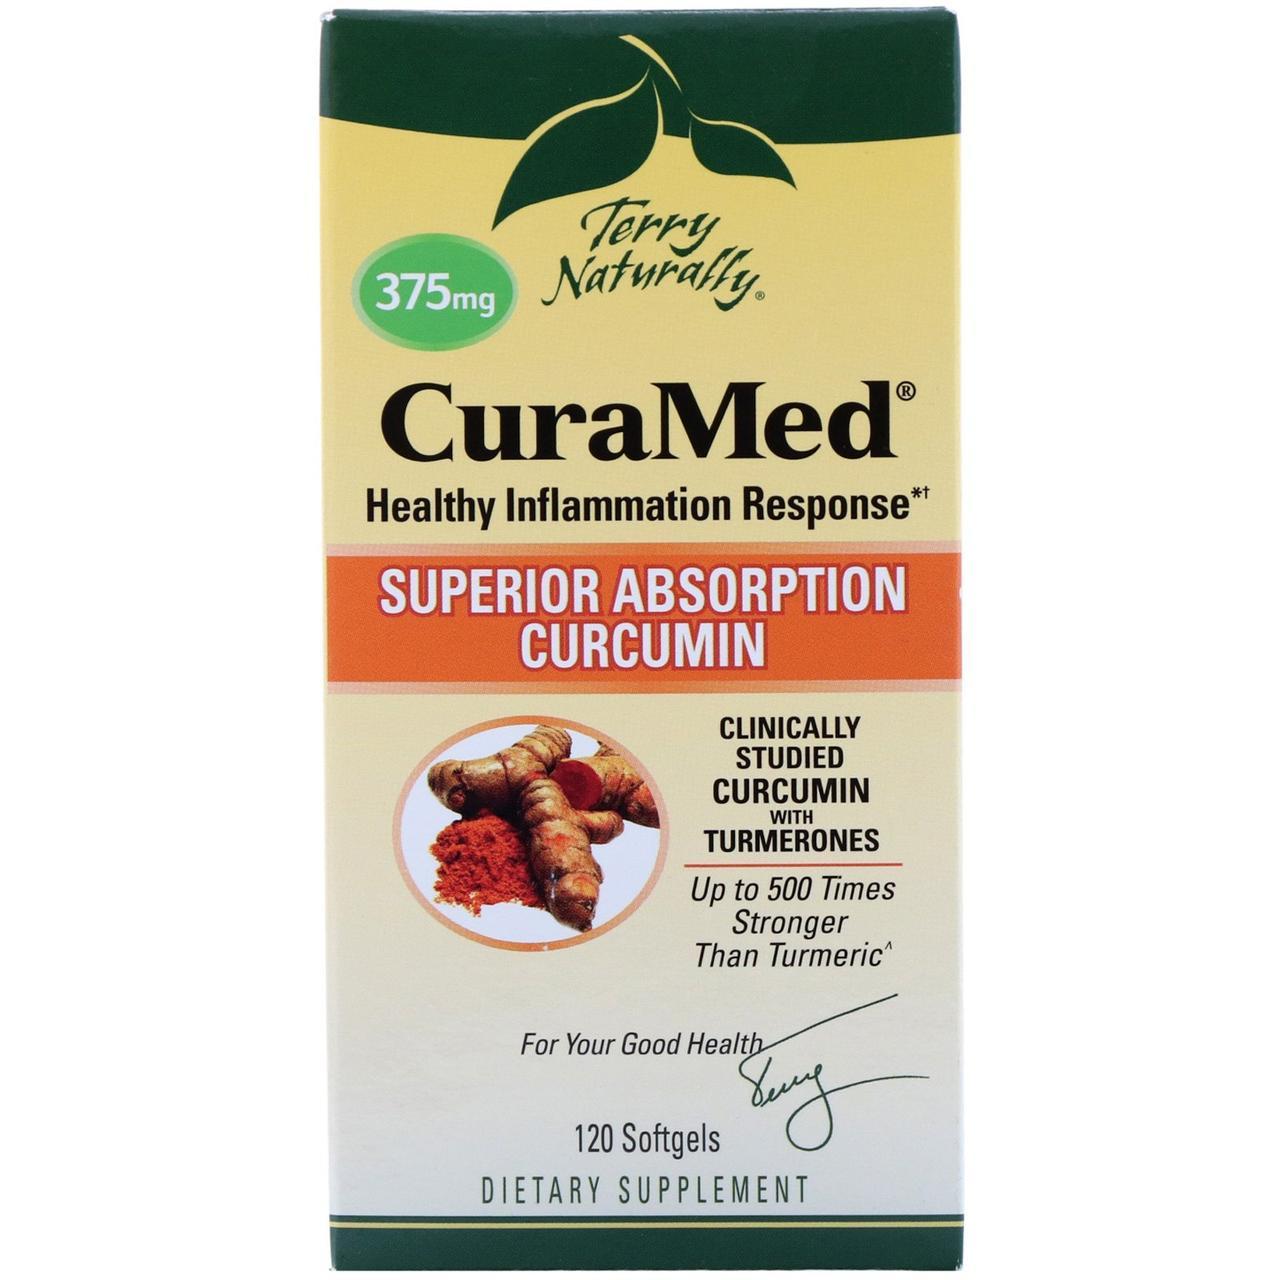 Курамед против воспаления CuraMed, 375 мг, EuroPharma, 120 капсул